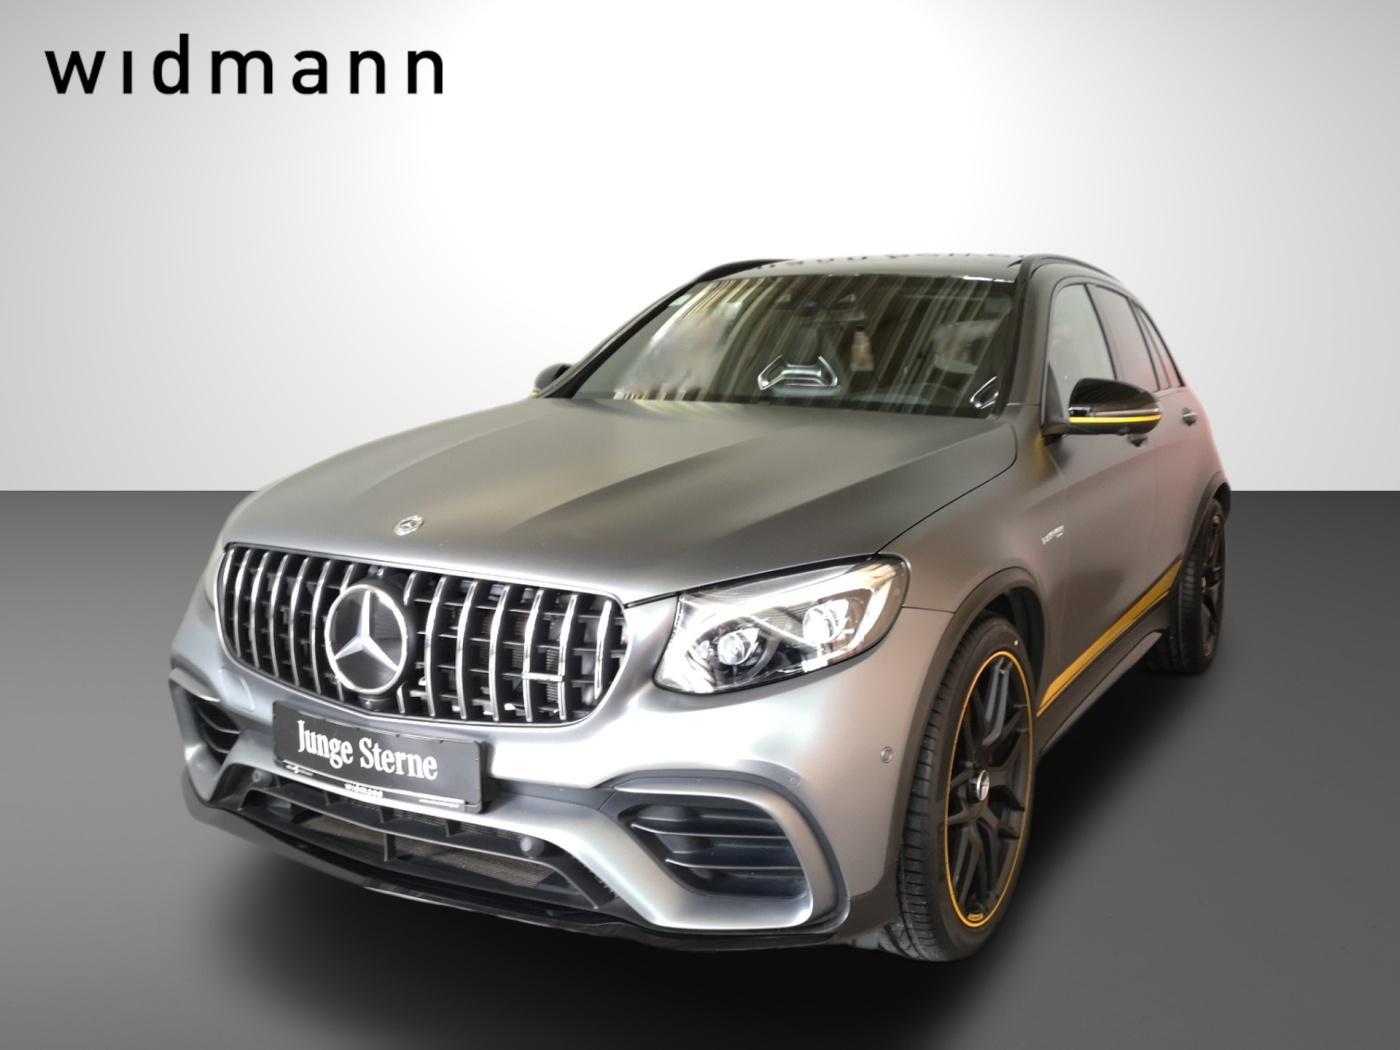 Mercedes-Benz GLC 63 AMG S 4MATIC+ *Edition 1*Perf. Sitze*Pano, Jahr 2018, Benzin